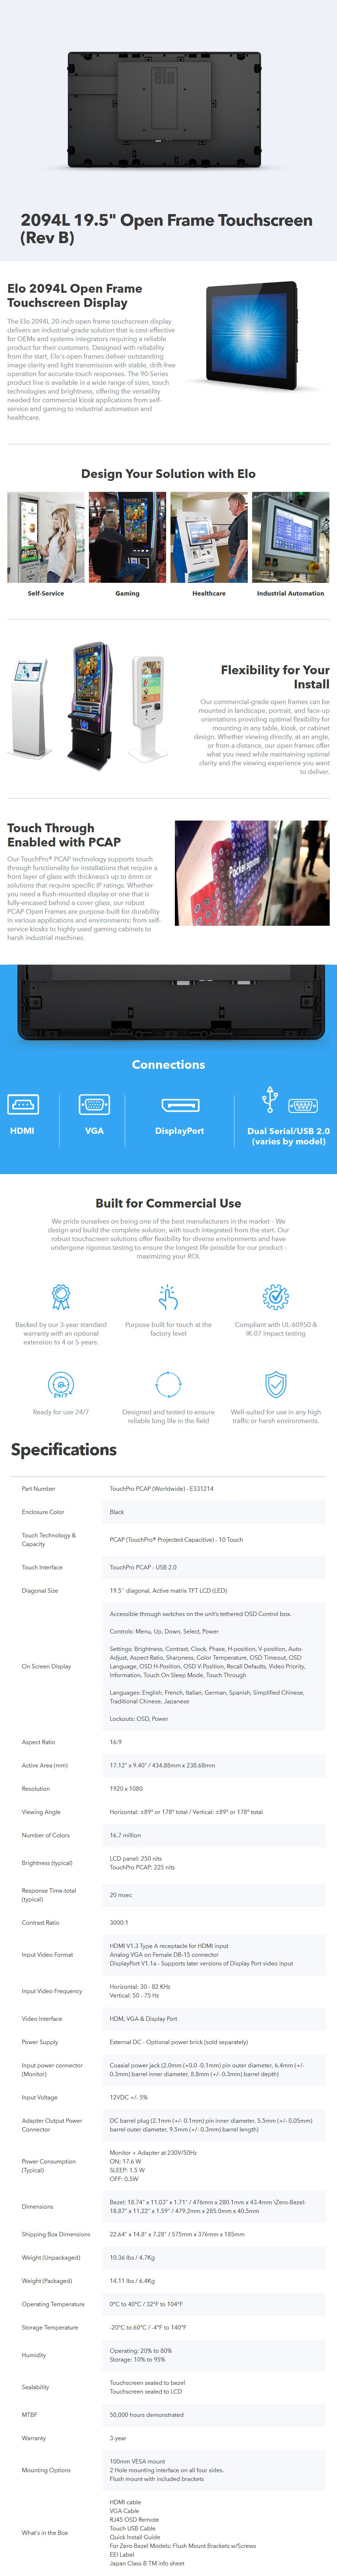 "Elo 2094L 19.5"" Open Frame Full HD Touchscreen POS Monitor - Desktop Overview 1"